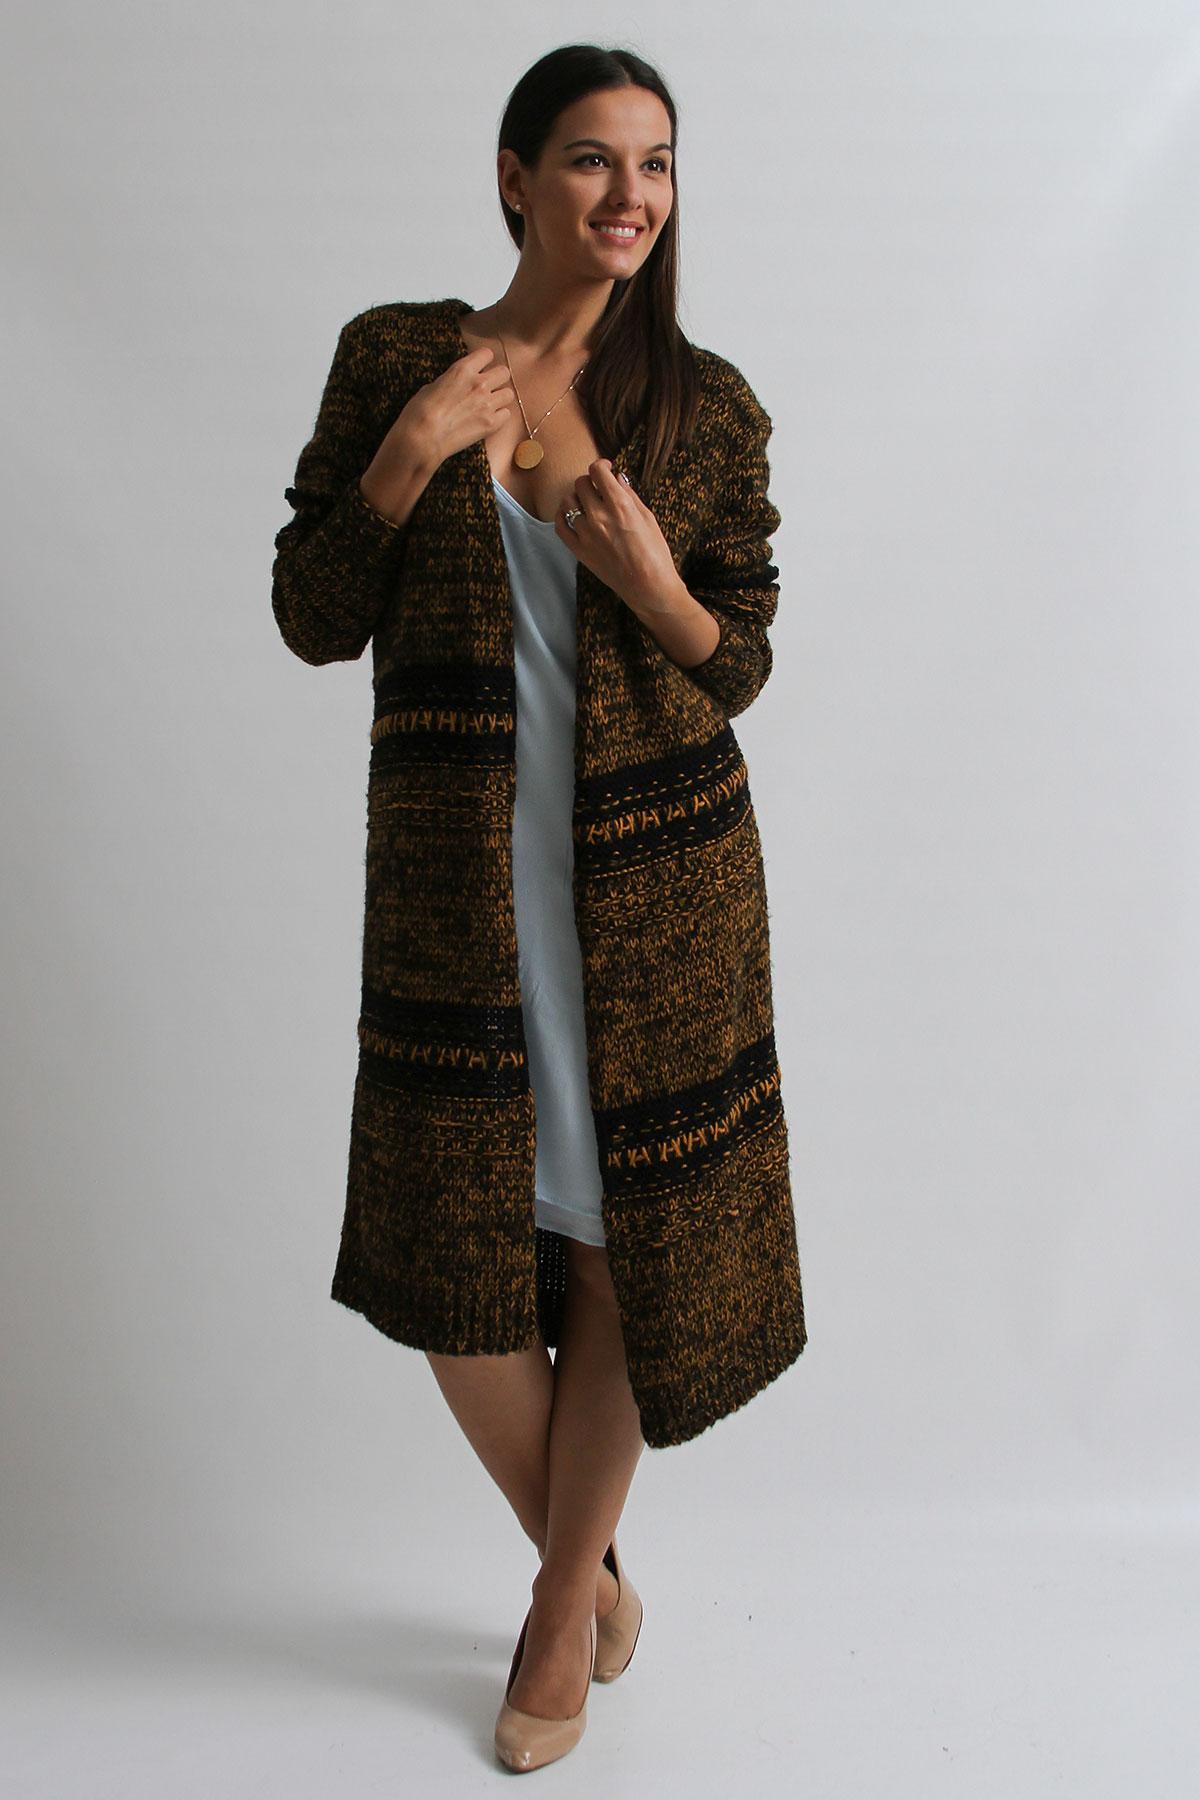 Cardigan Topshop Fashionable